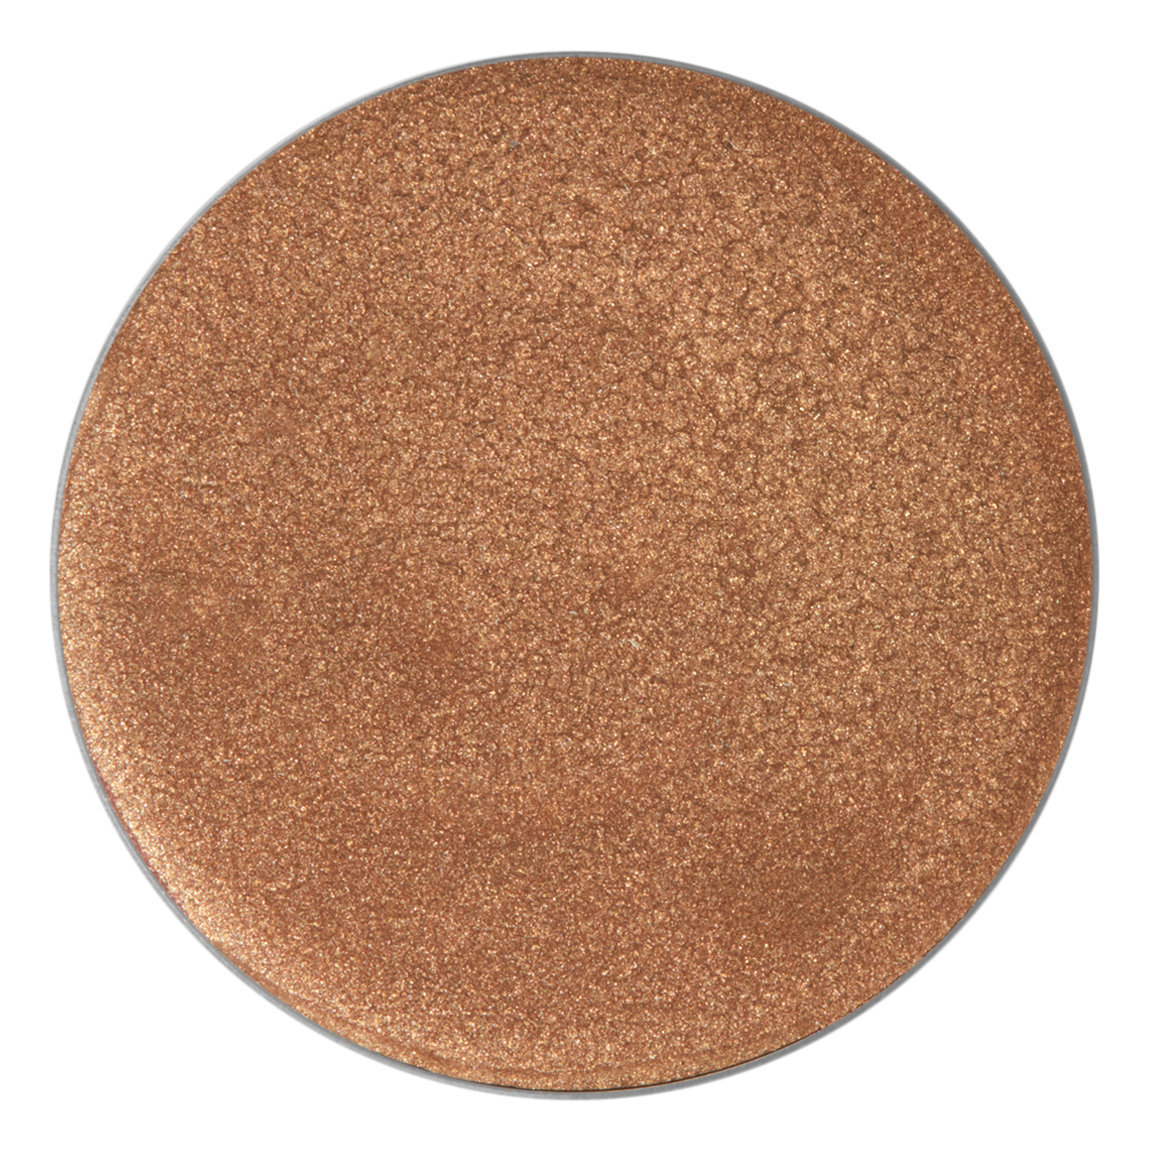 Kjaer Weis Cream Eye Shadow Refill Alluring alternative view 1 - product swatch.